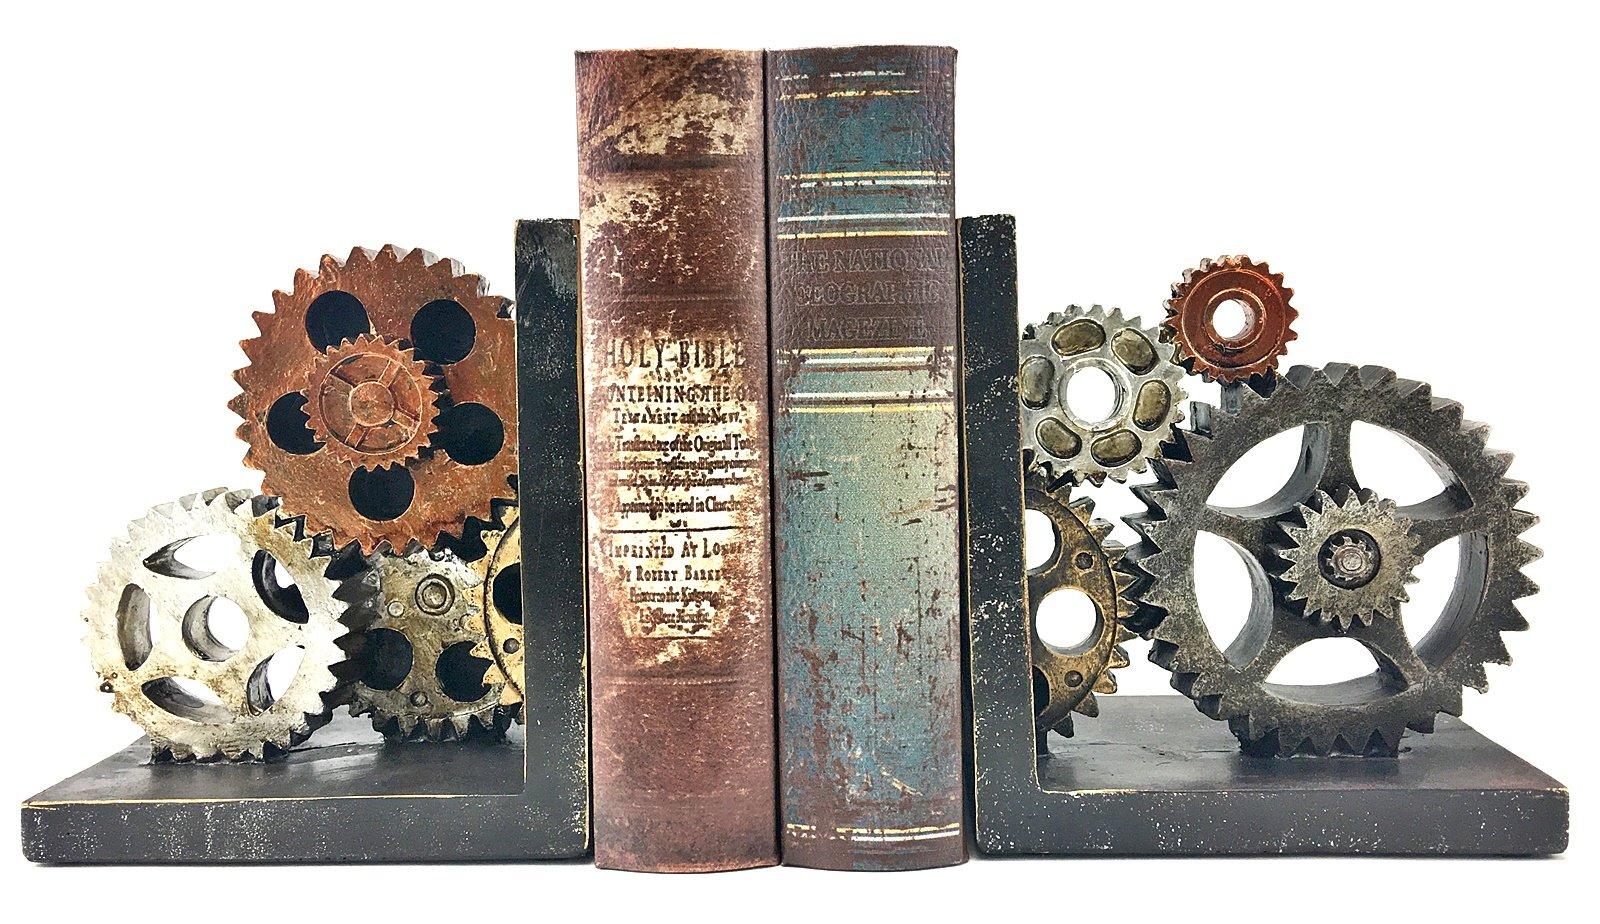 Bellaa 20881 Gear Bookends Industrial Vintage Style 6 inch by Bellaa